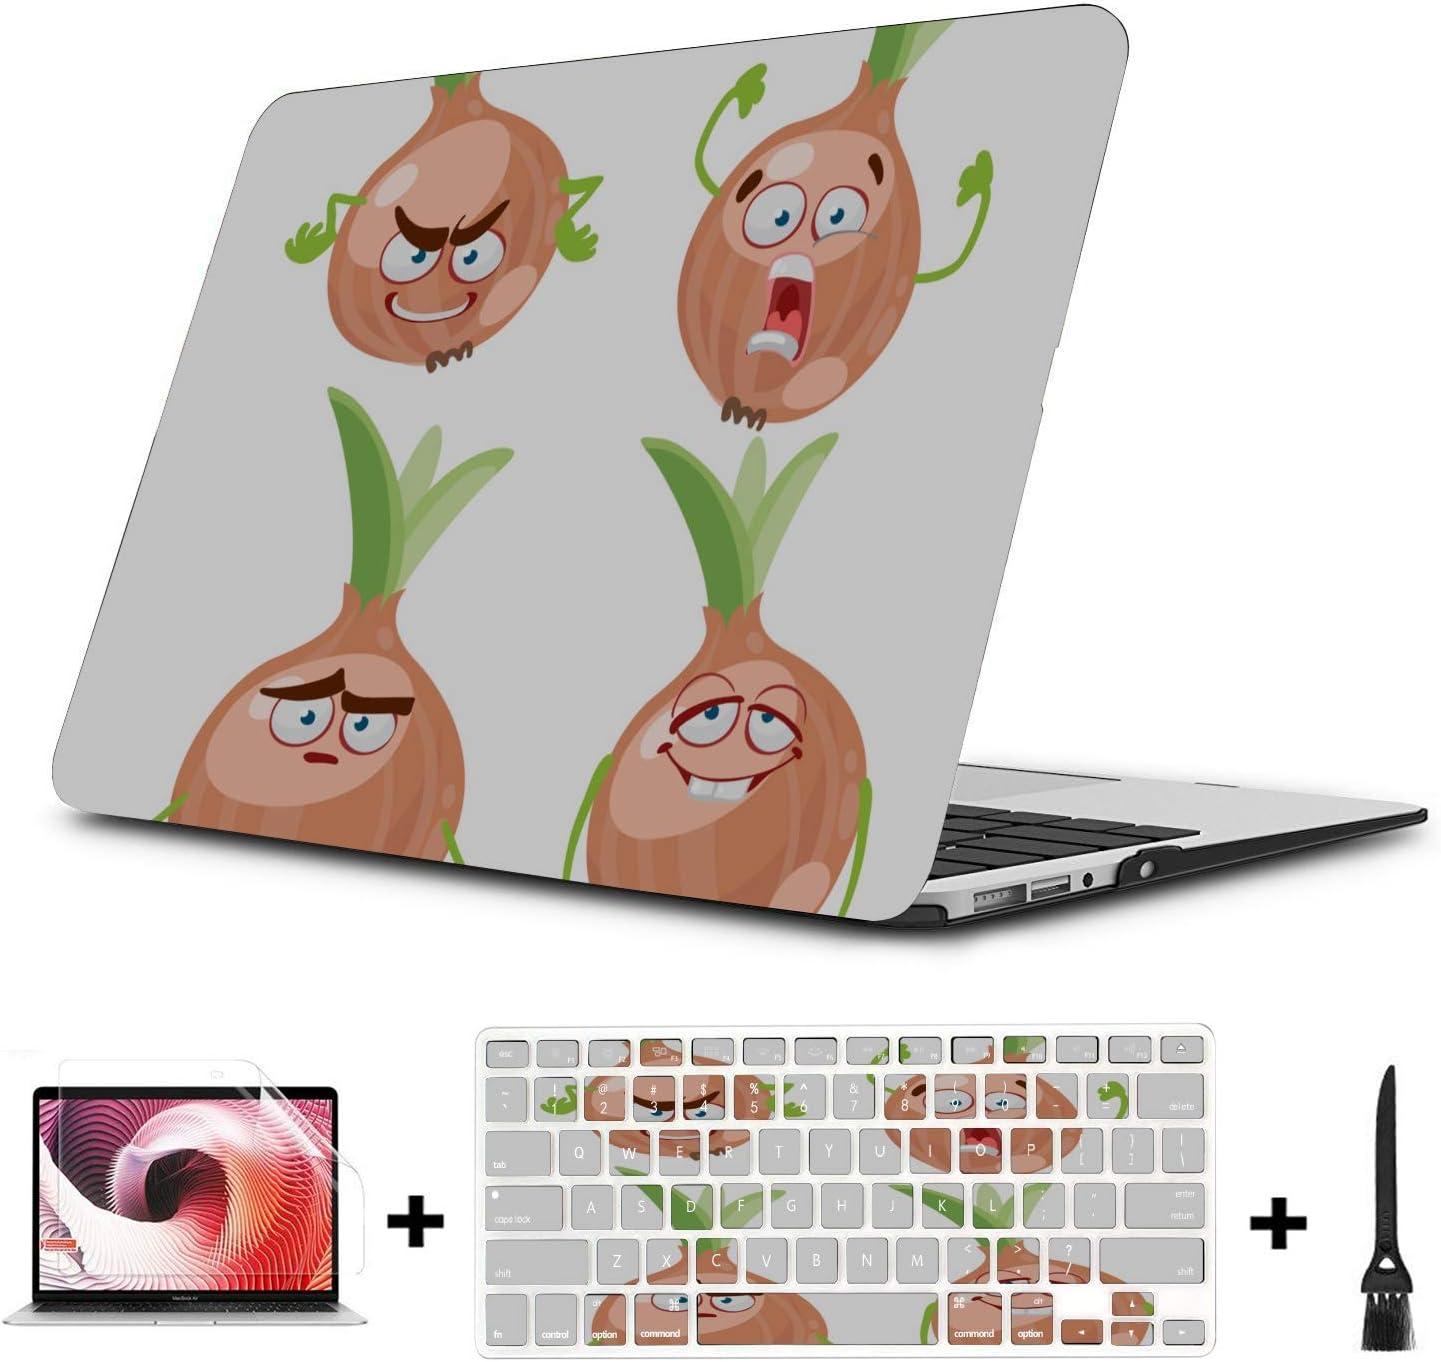 MacBook Air Computer Case Cartoon Smiling Onion Vegetables Plastic Hard Shell Compatible Mac Air 11 Pro 13 15 MacBook Air A1466 Case Protection for MacBook 2016-2019 Version